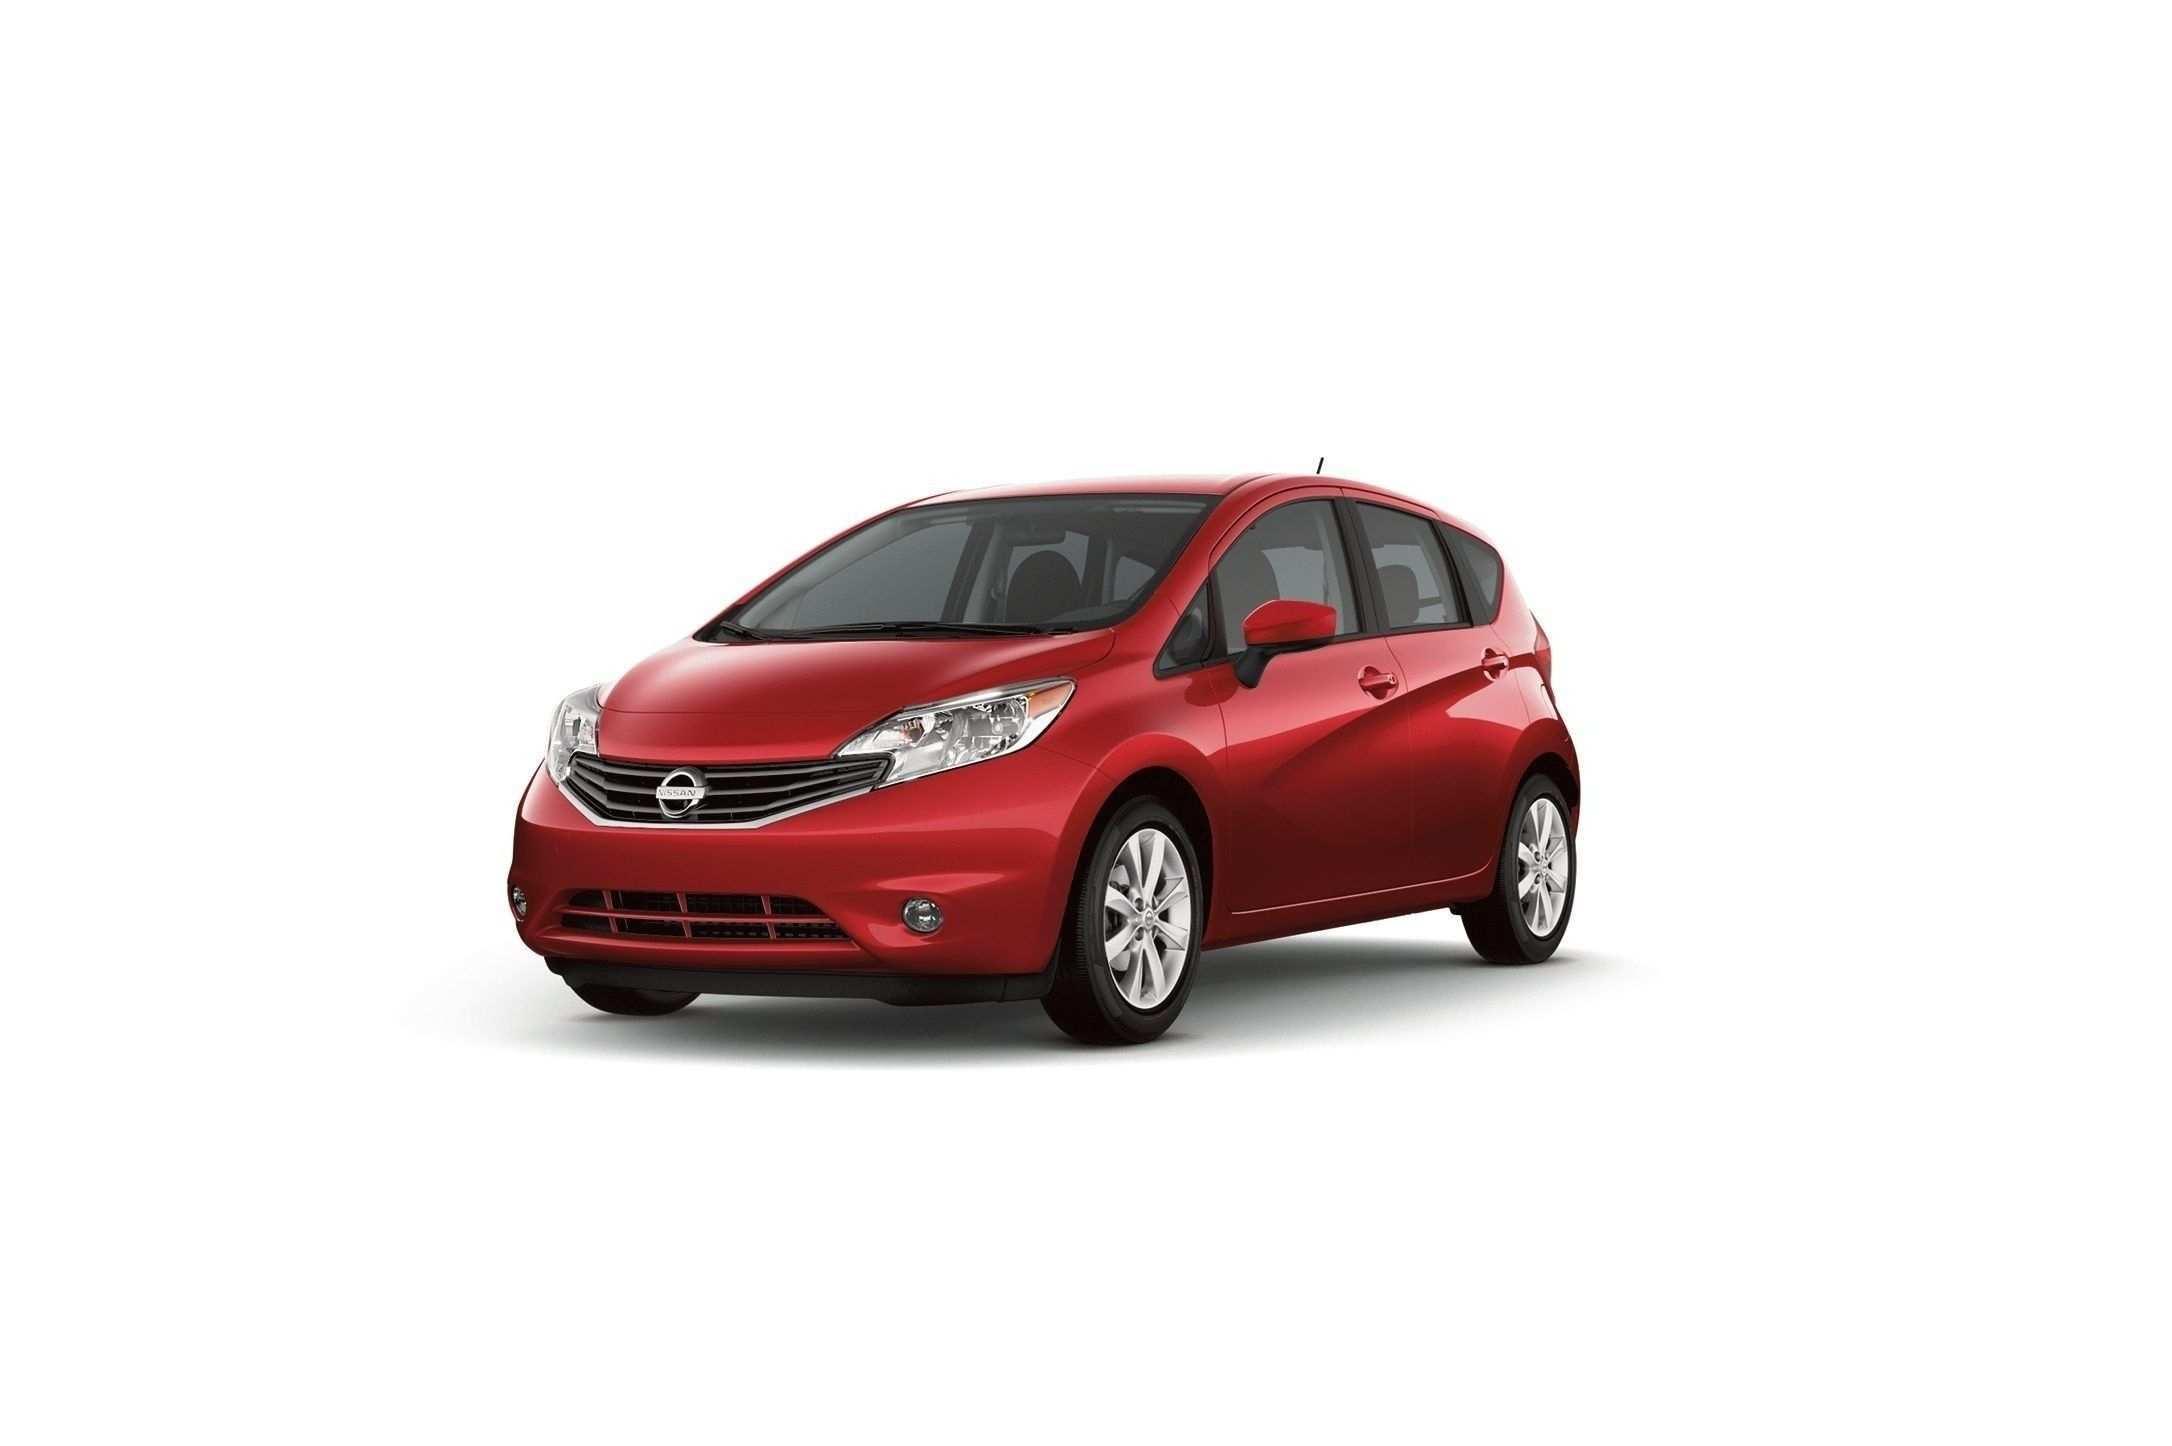 64 New 2020 Nissan Tiida Mexico Uae Ratings by 2020 Nissan Tiida Mexico Uae